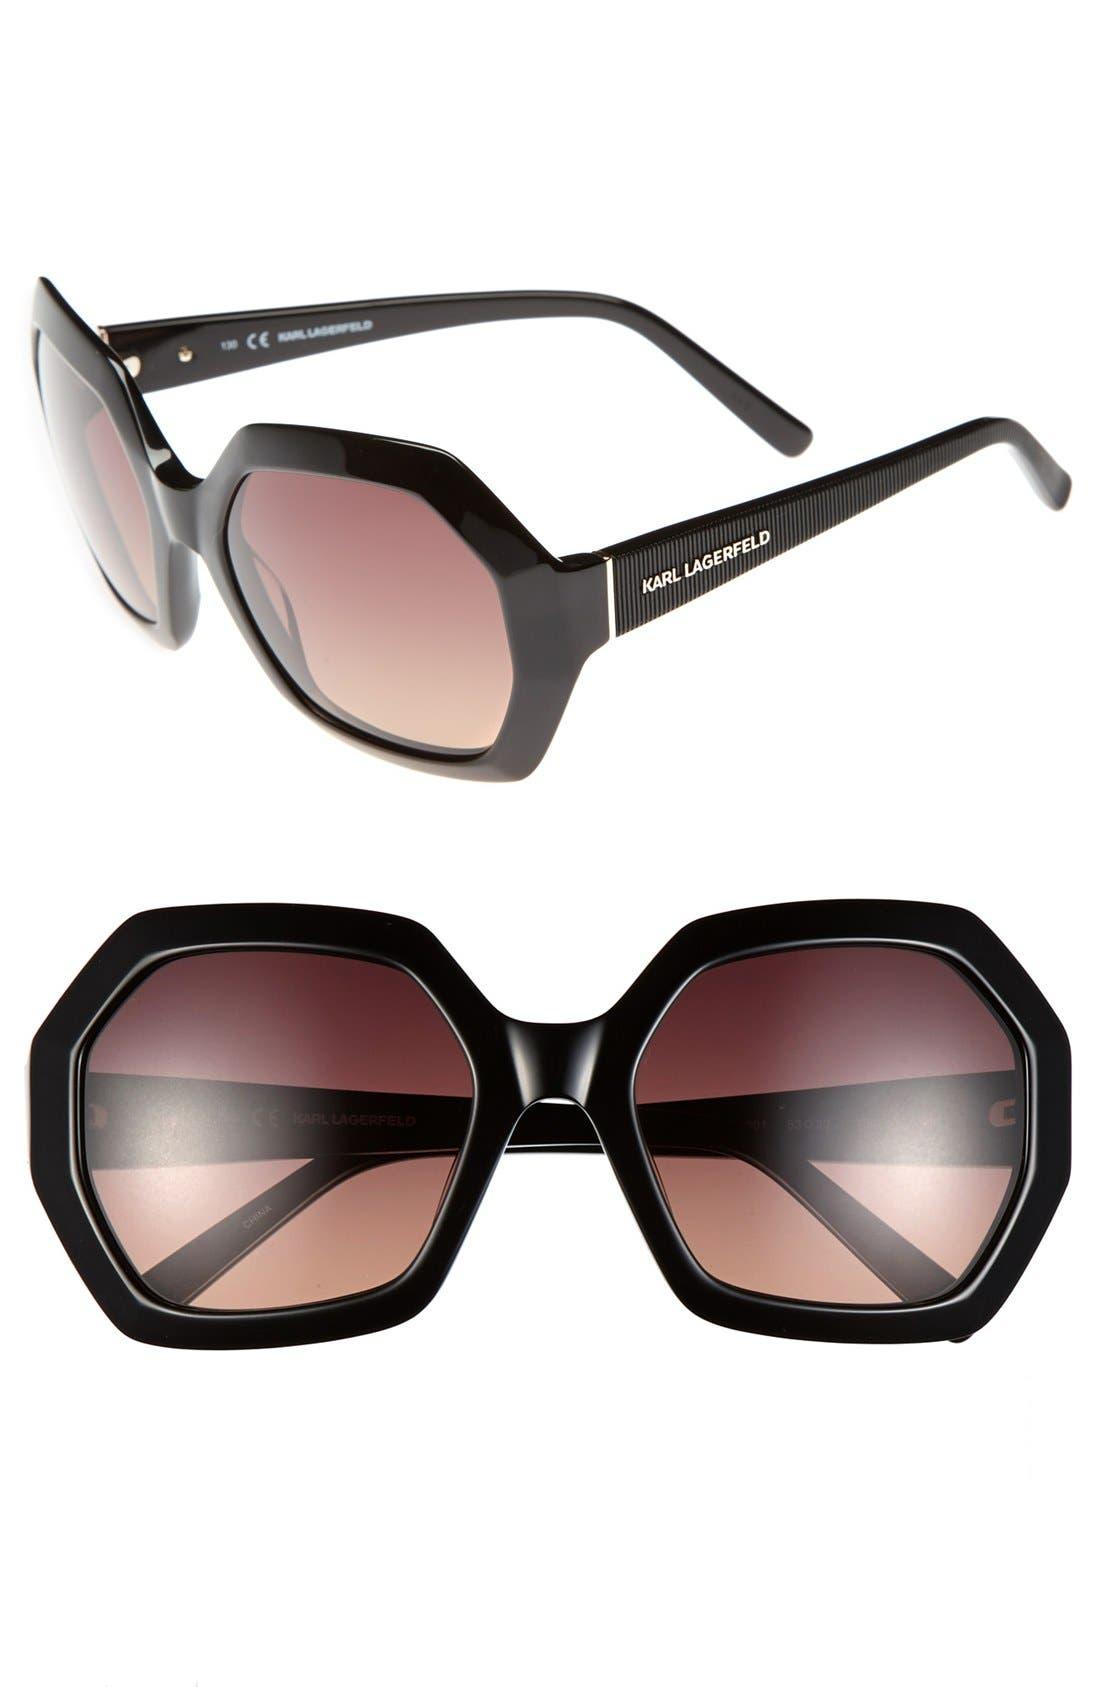 Main Image - Karl Lagerfeld 53mm Oversized Sunglasses